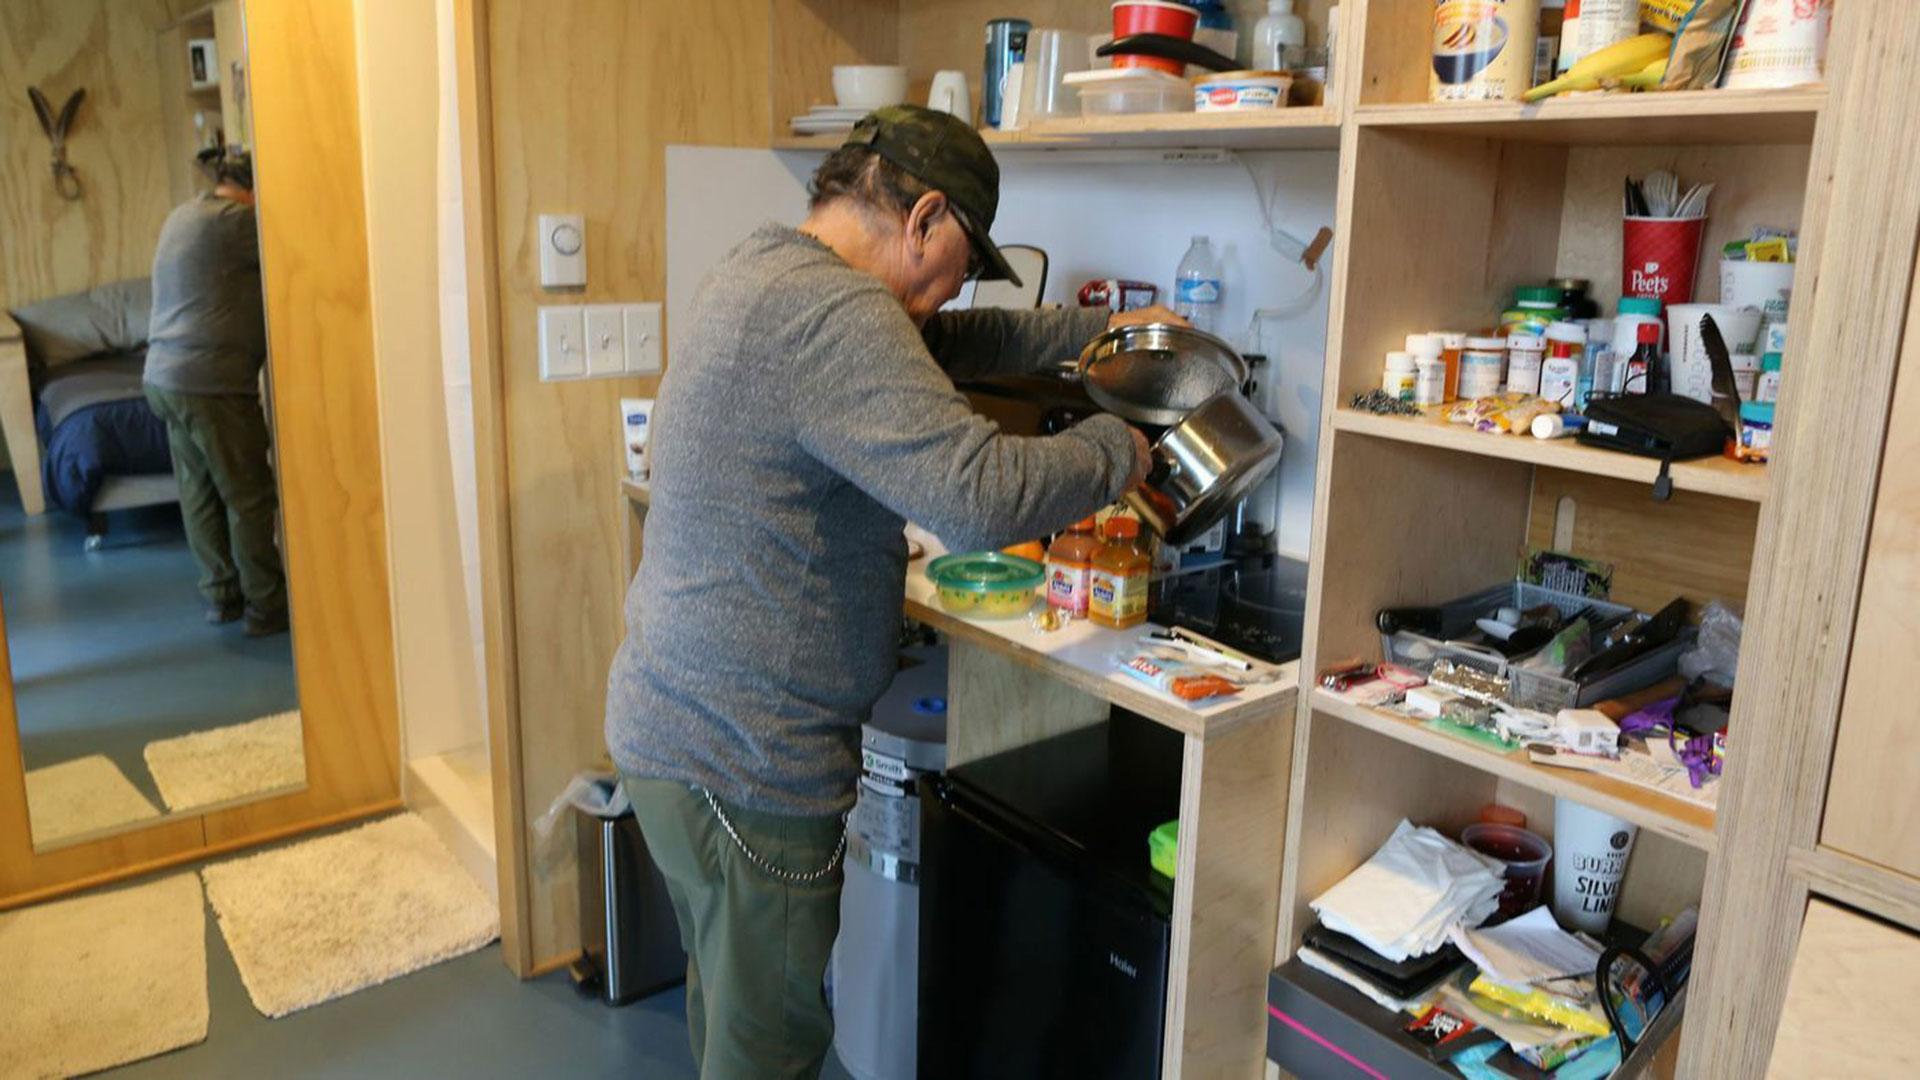 Robert Desjarlais era homeless en Seattle, donde se beneficióde un proyecto similar al que se pone en marchaen Los Ángeles